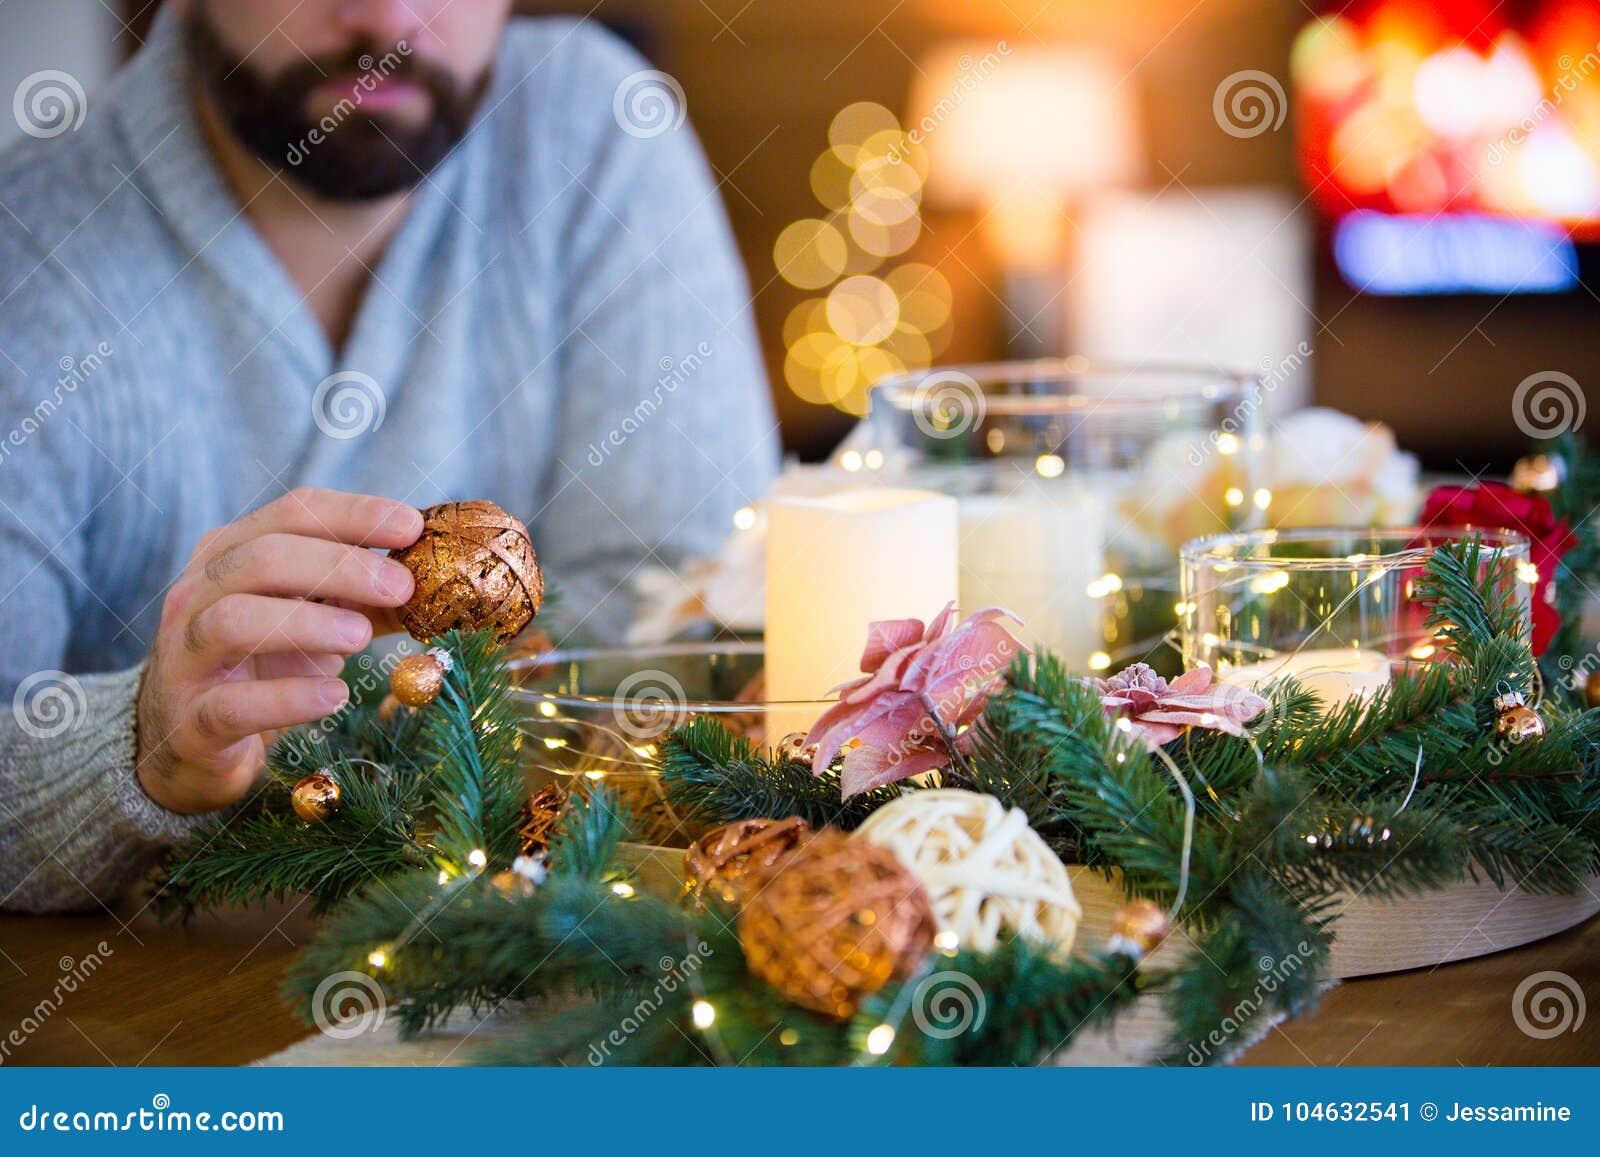 Download Gebaarde Mens Die Kerstmislijst Verfraaien Stock Afbeelding - Afbeelding bestaande uit fireplace, decorating: 104632541